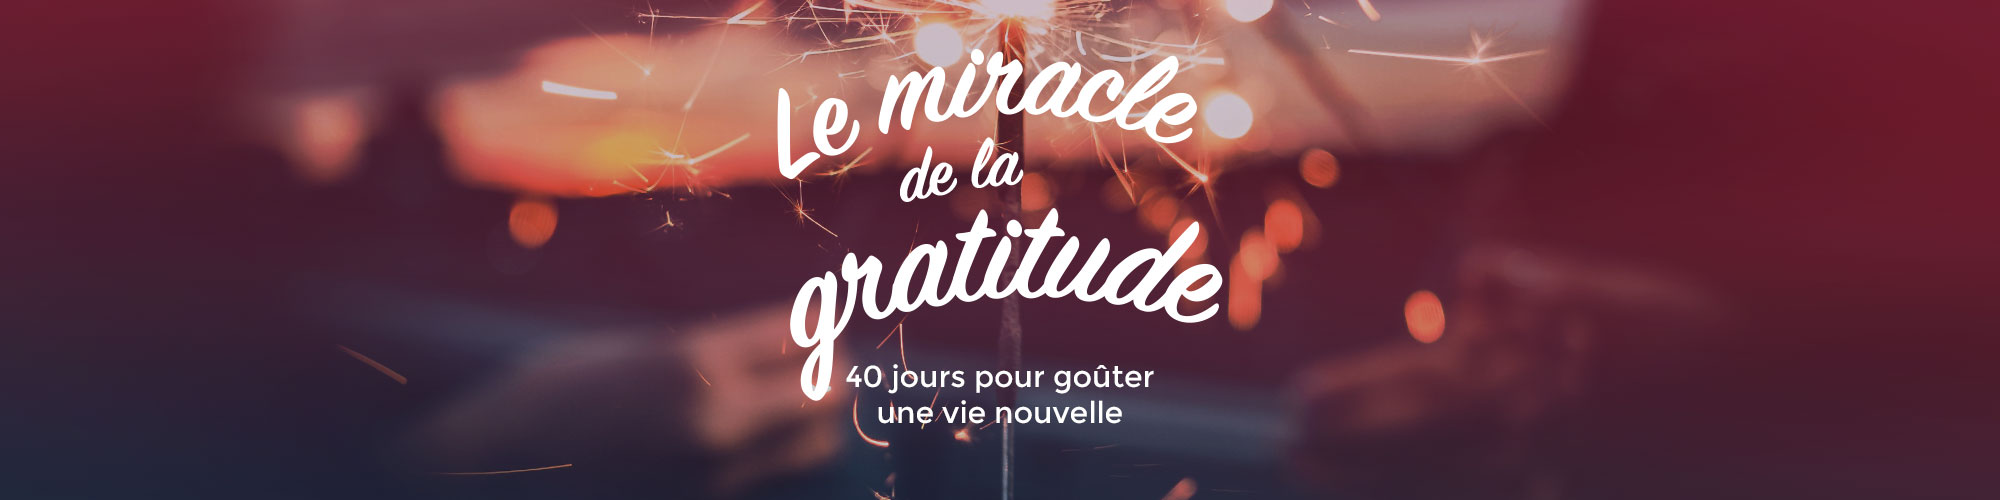 background-gratitude-page